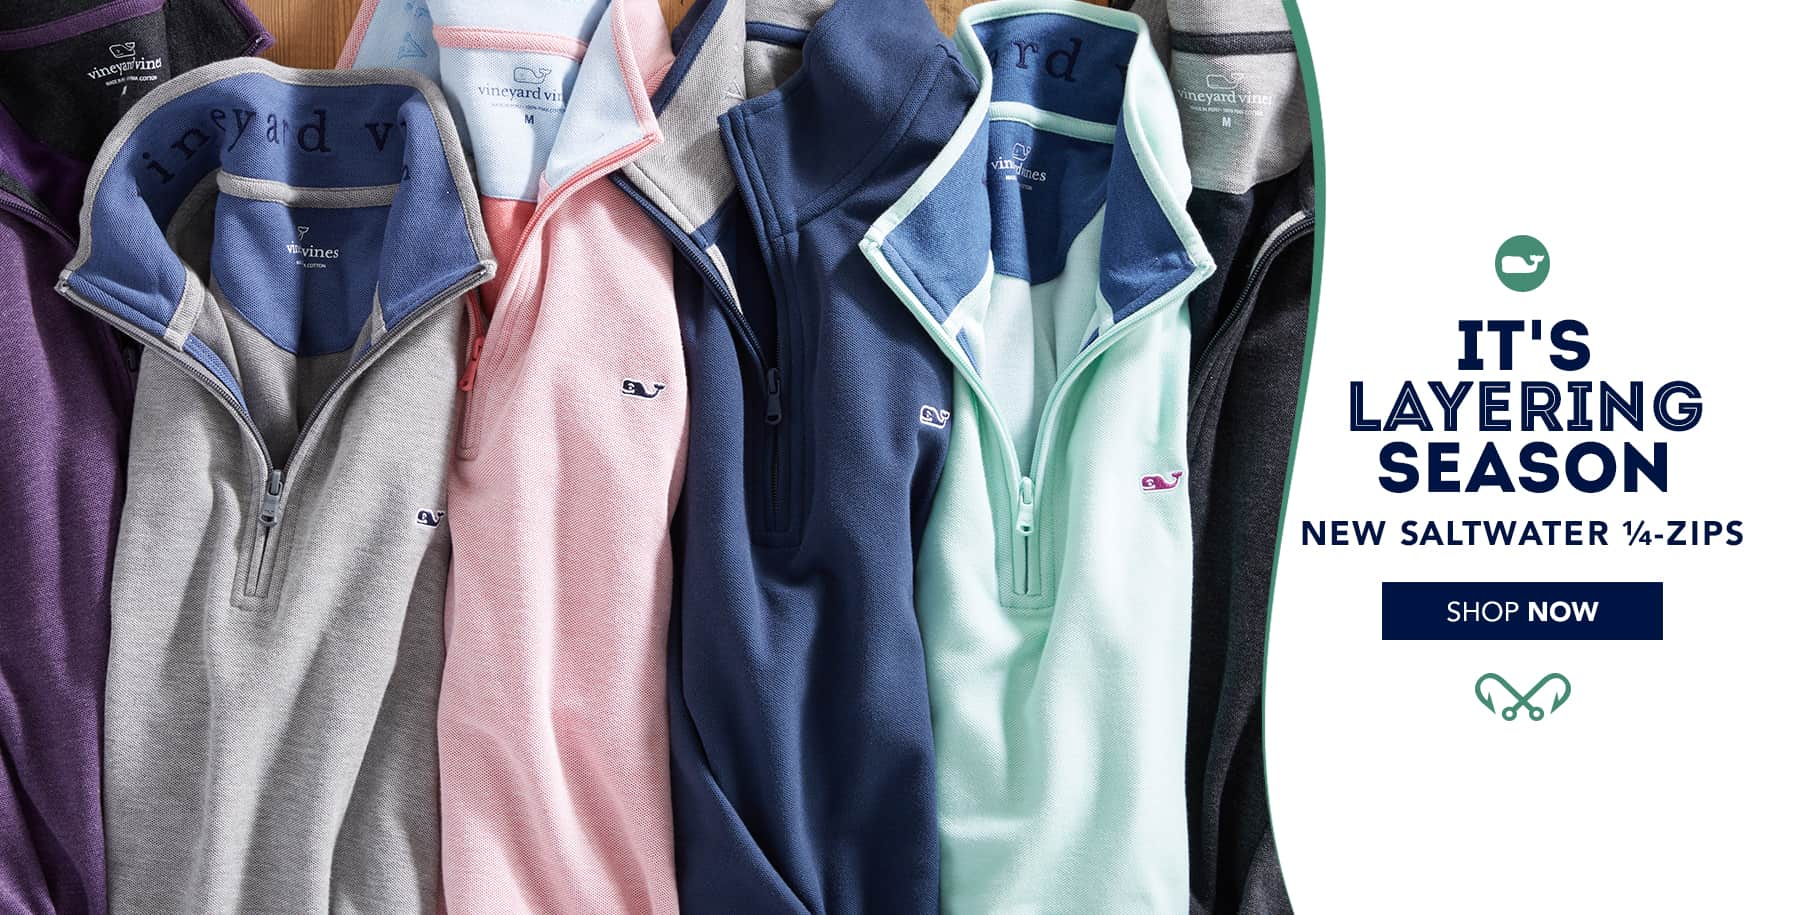 It's layering season. New Saltwater 1/4-Zips for Men. Shop now.